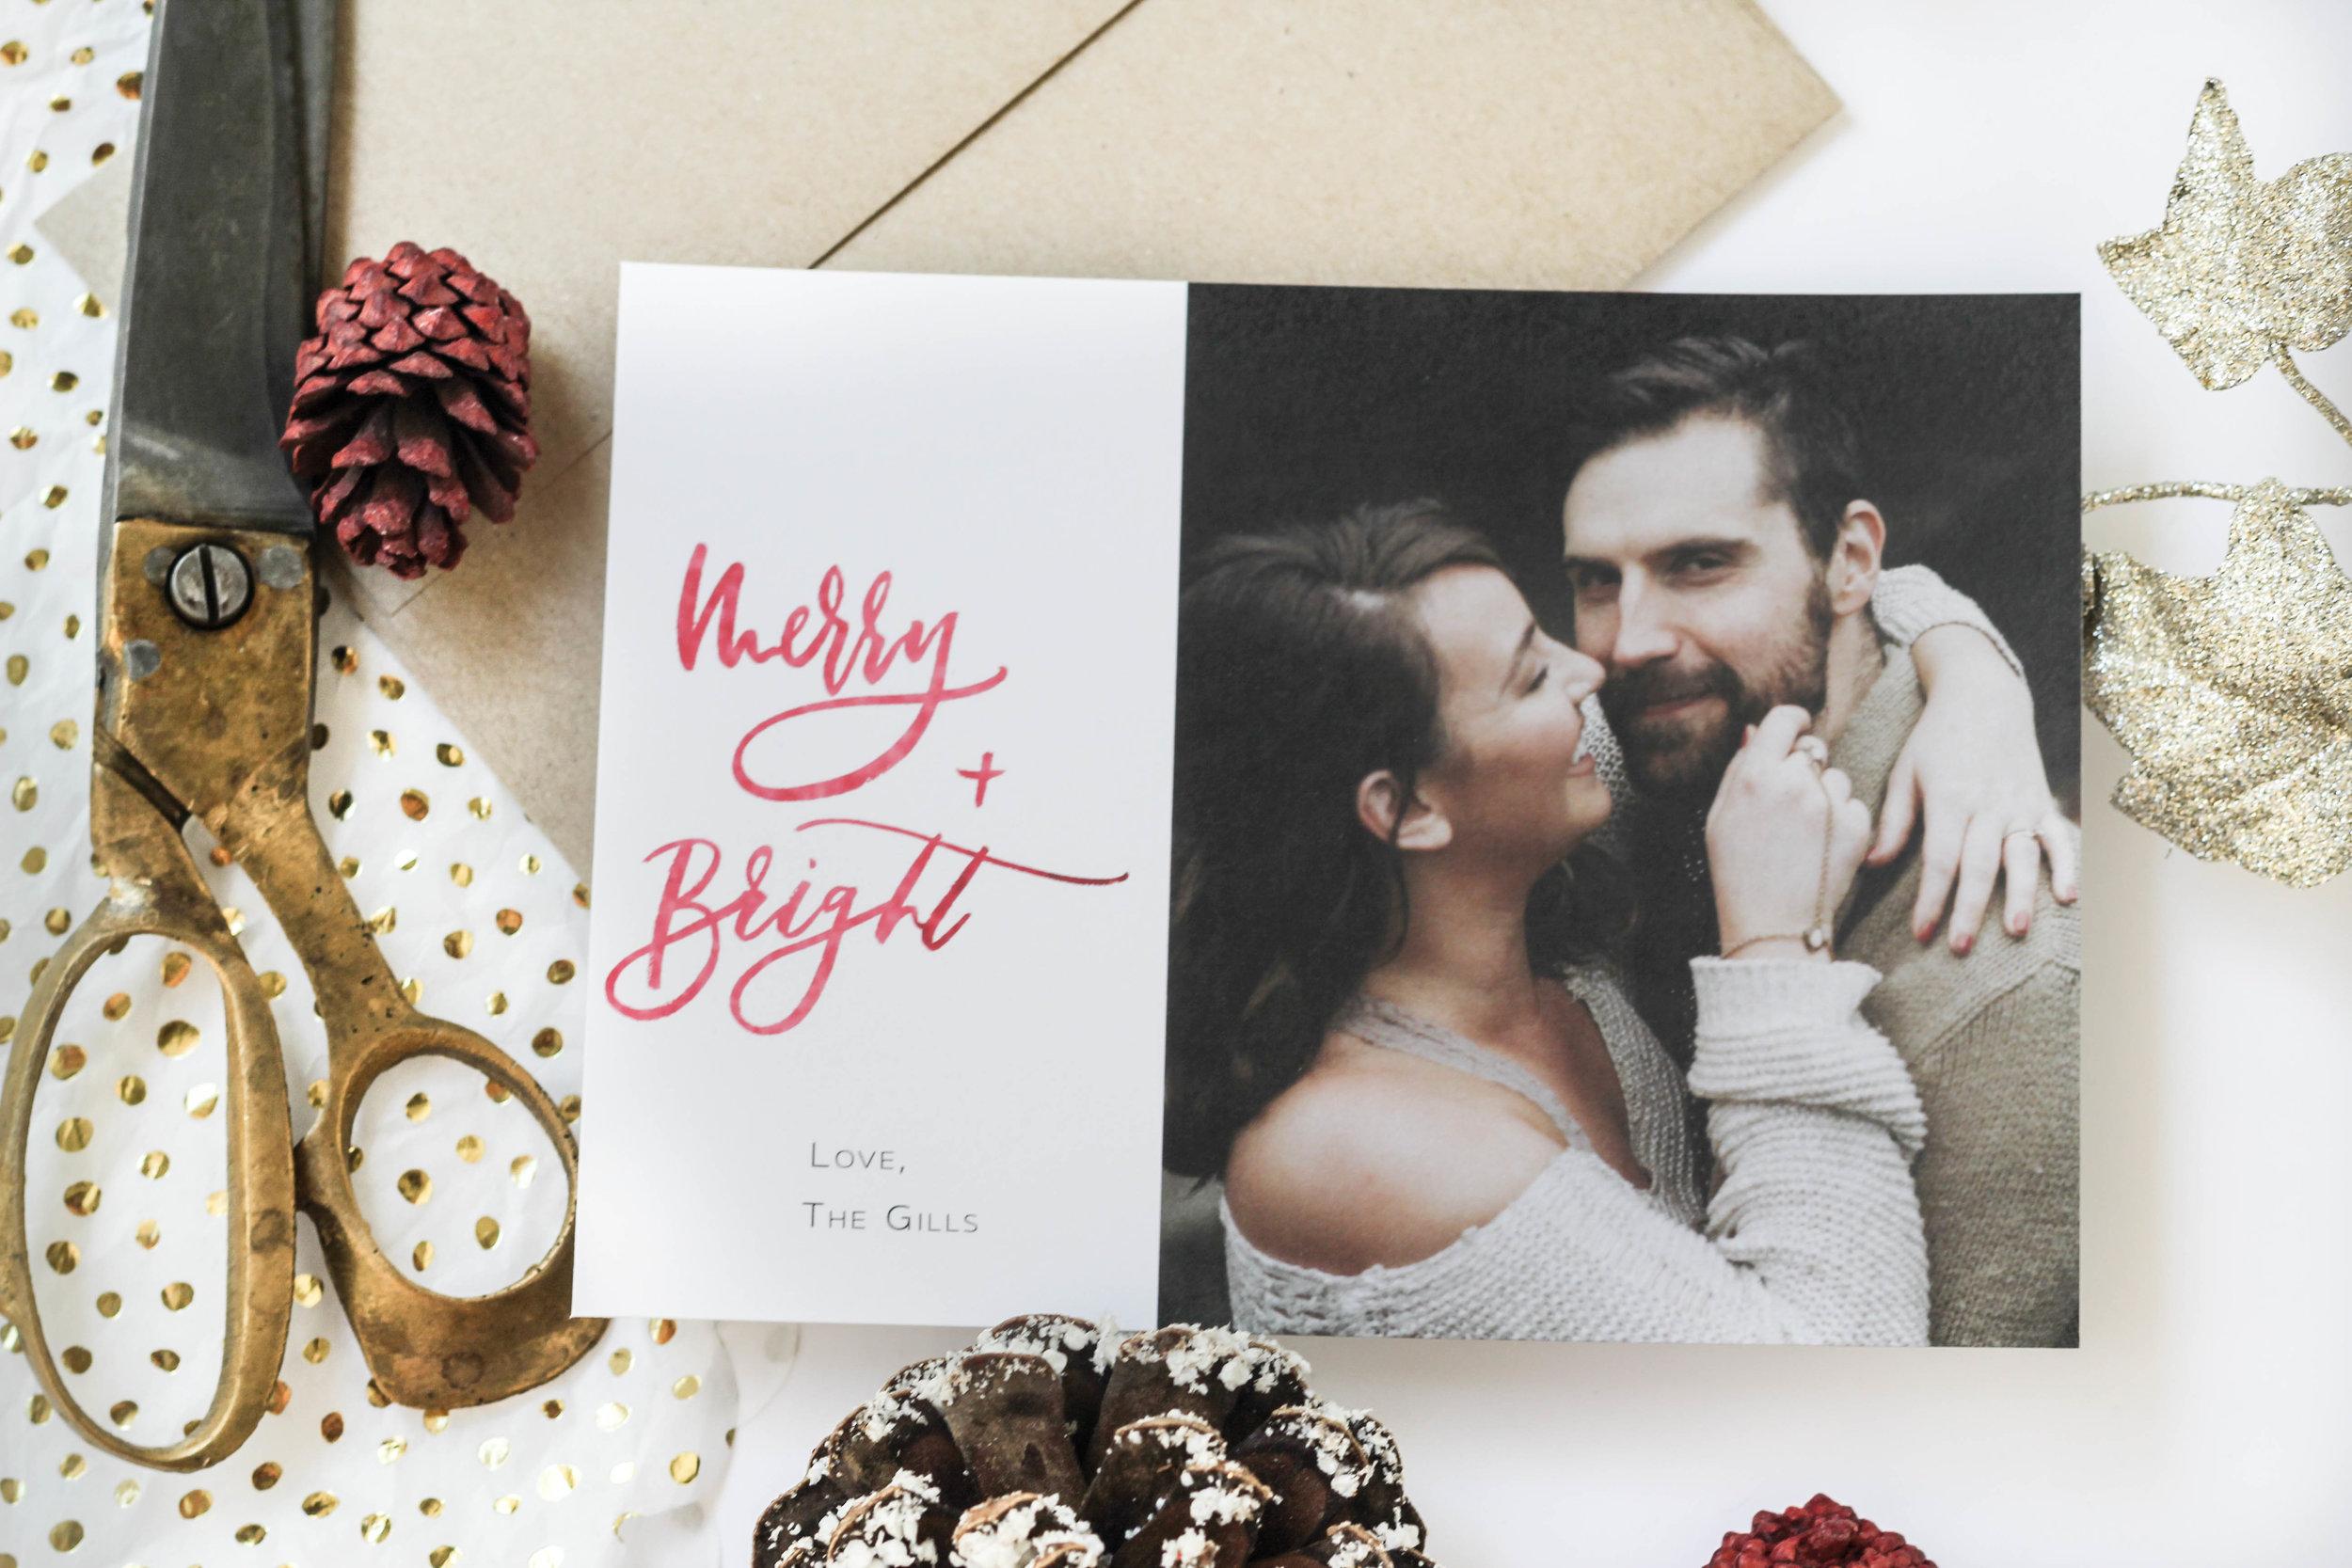 Merry + Bright Christmas Card